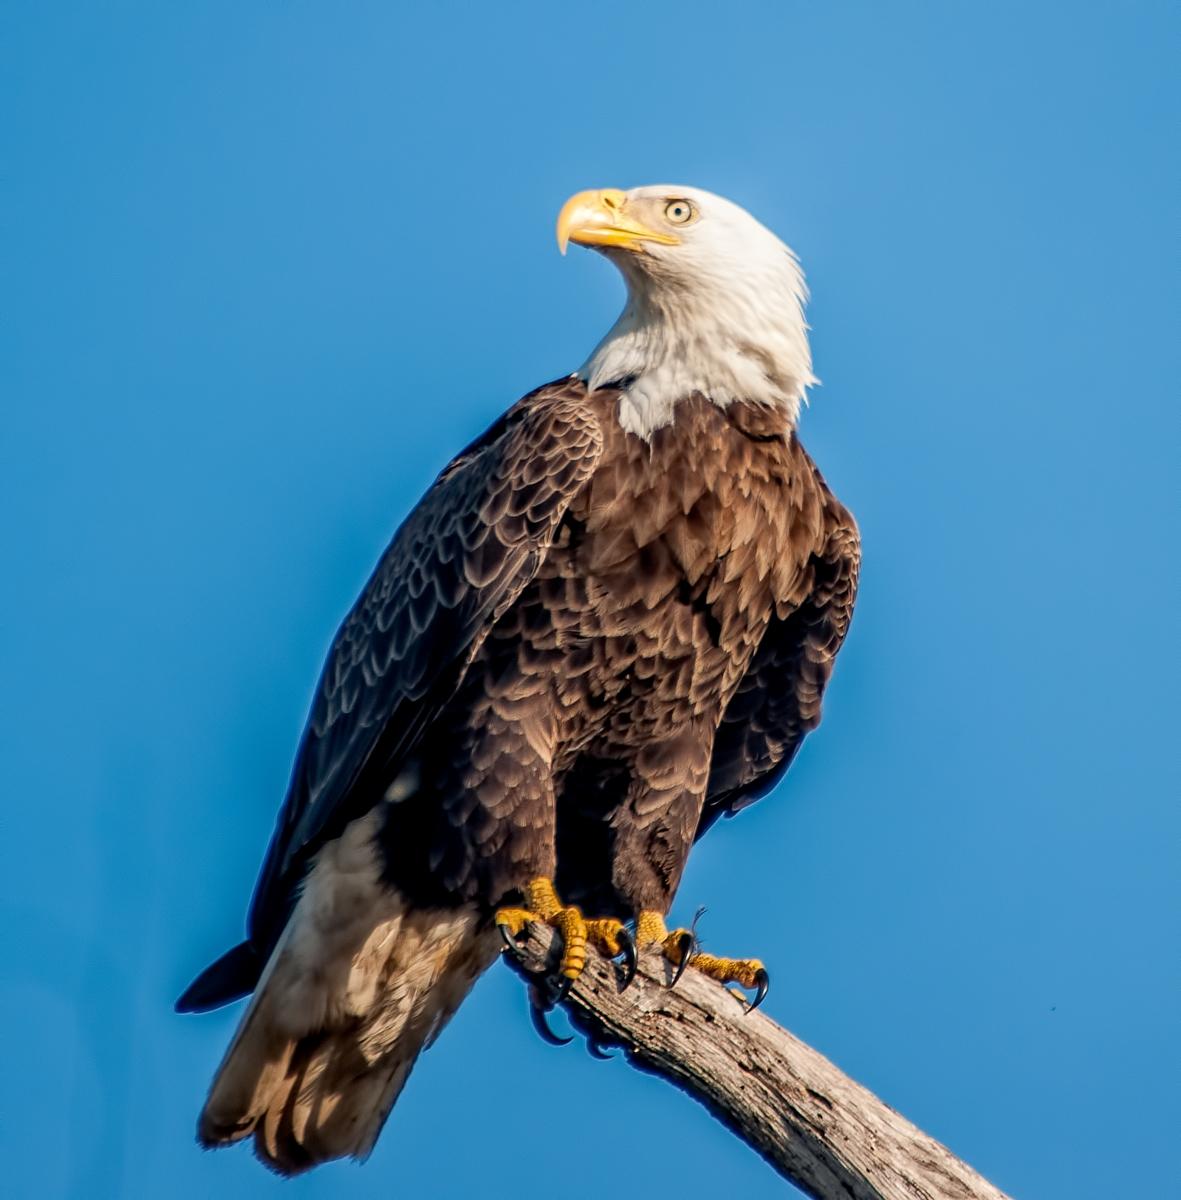 File:Eagle looking left.jpg - Wikimedia Commons